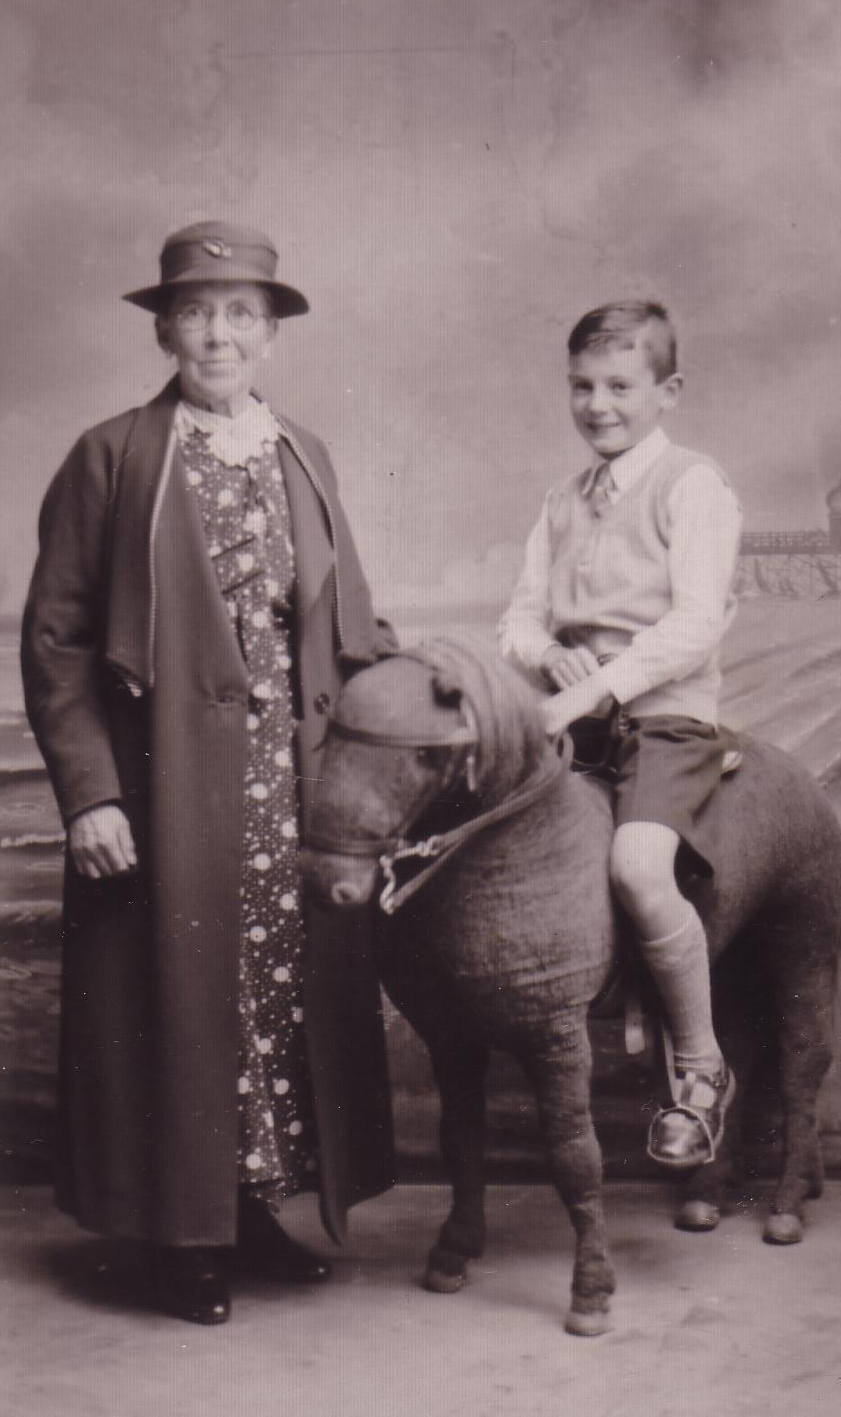 Studio Portrait Woman With Boy Sitting On Stuffed Donkey 1930s